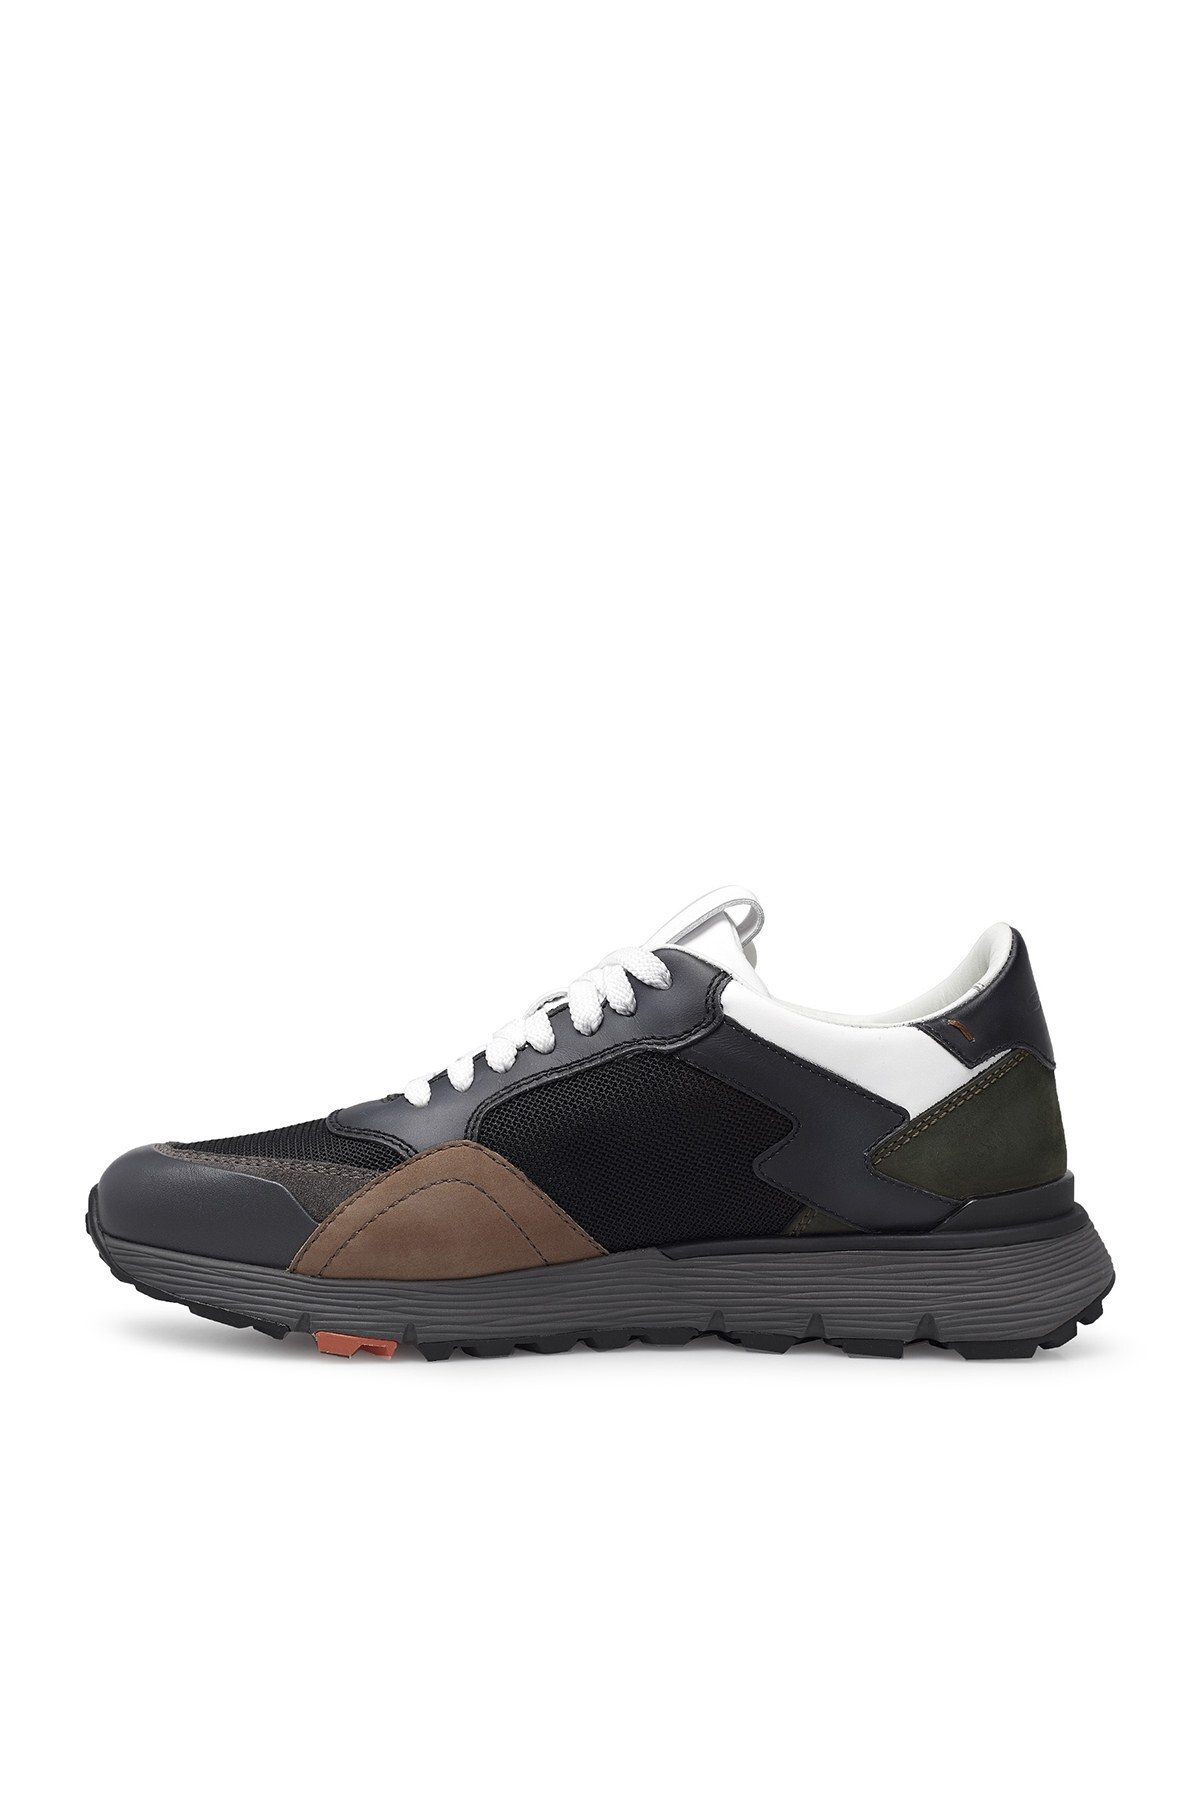 Santoni Erkek Ayakkabı MBCR21297ANAGWSNN40 SİYAH-GRİ